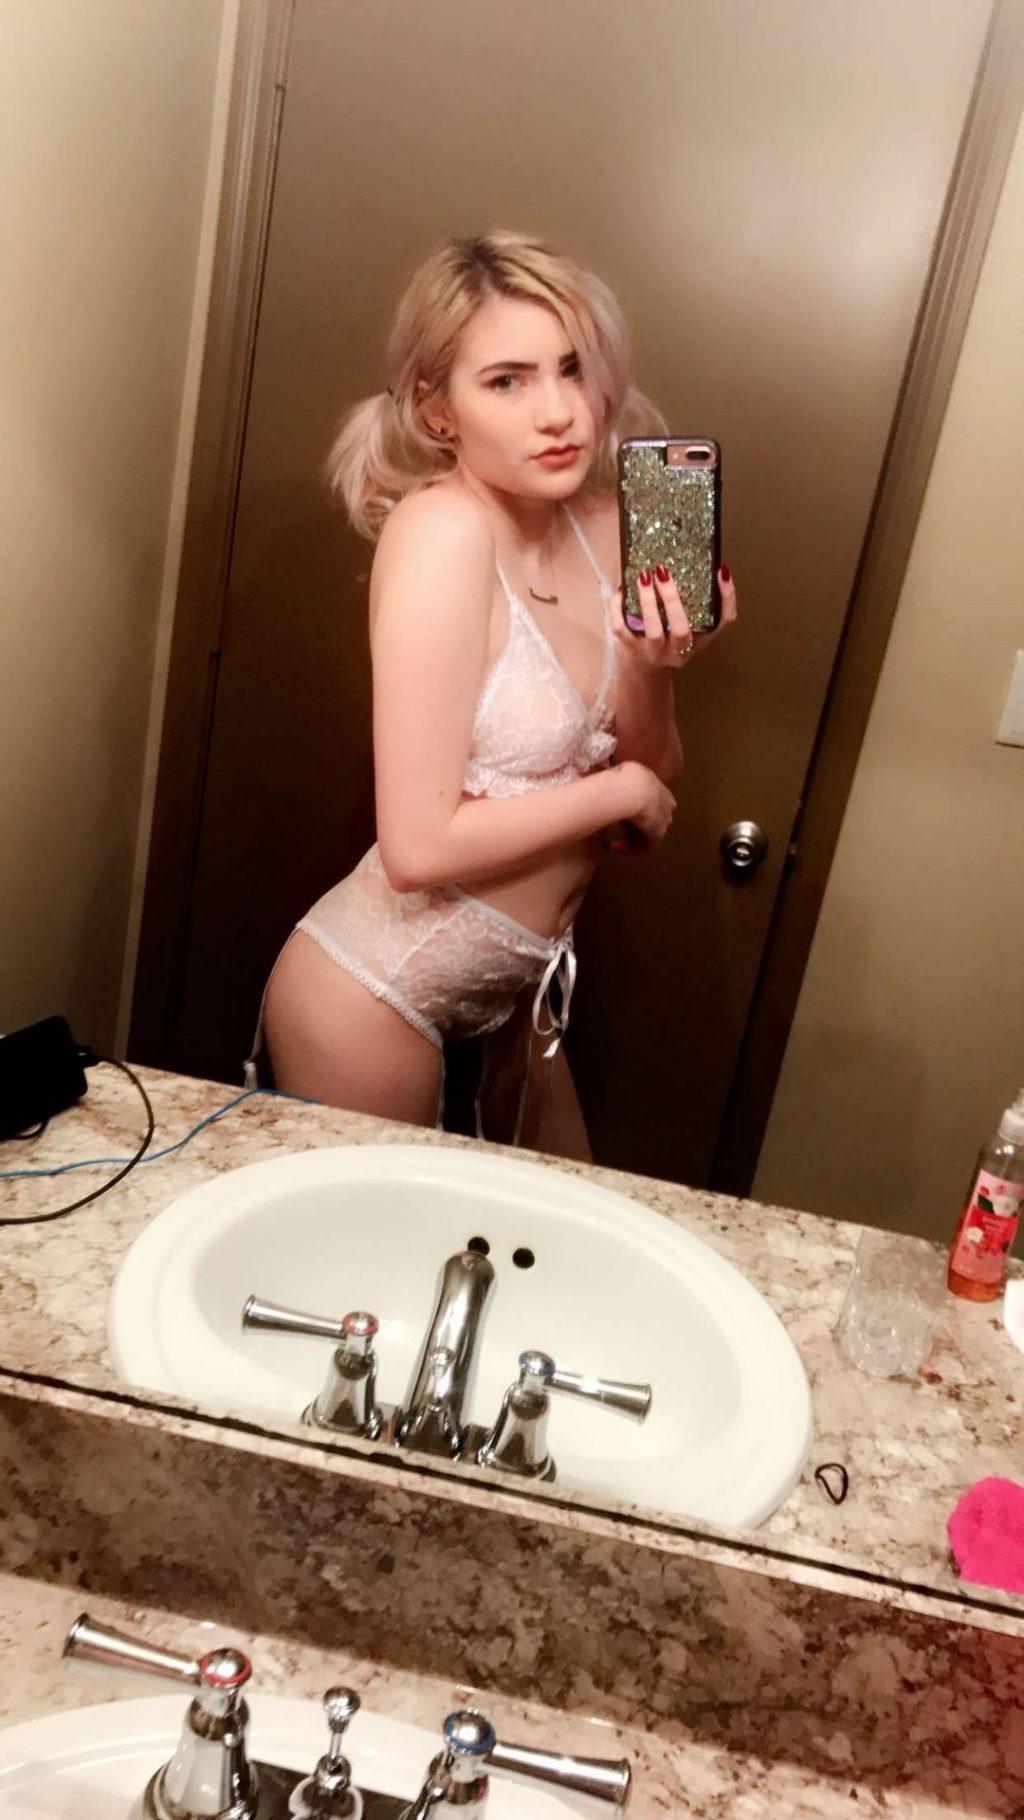 Cloveress Nude Sexy Thefappeningblog Com 32 1024x1820